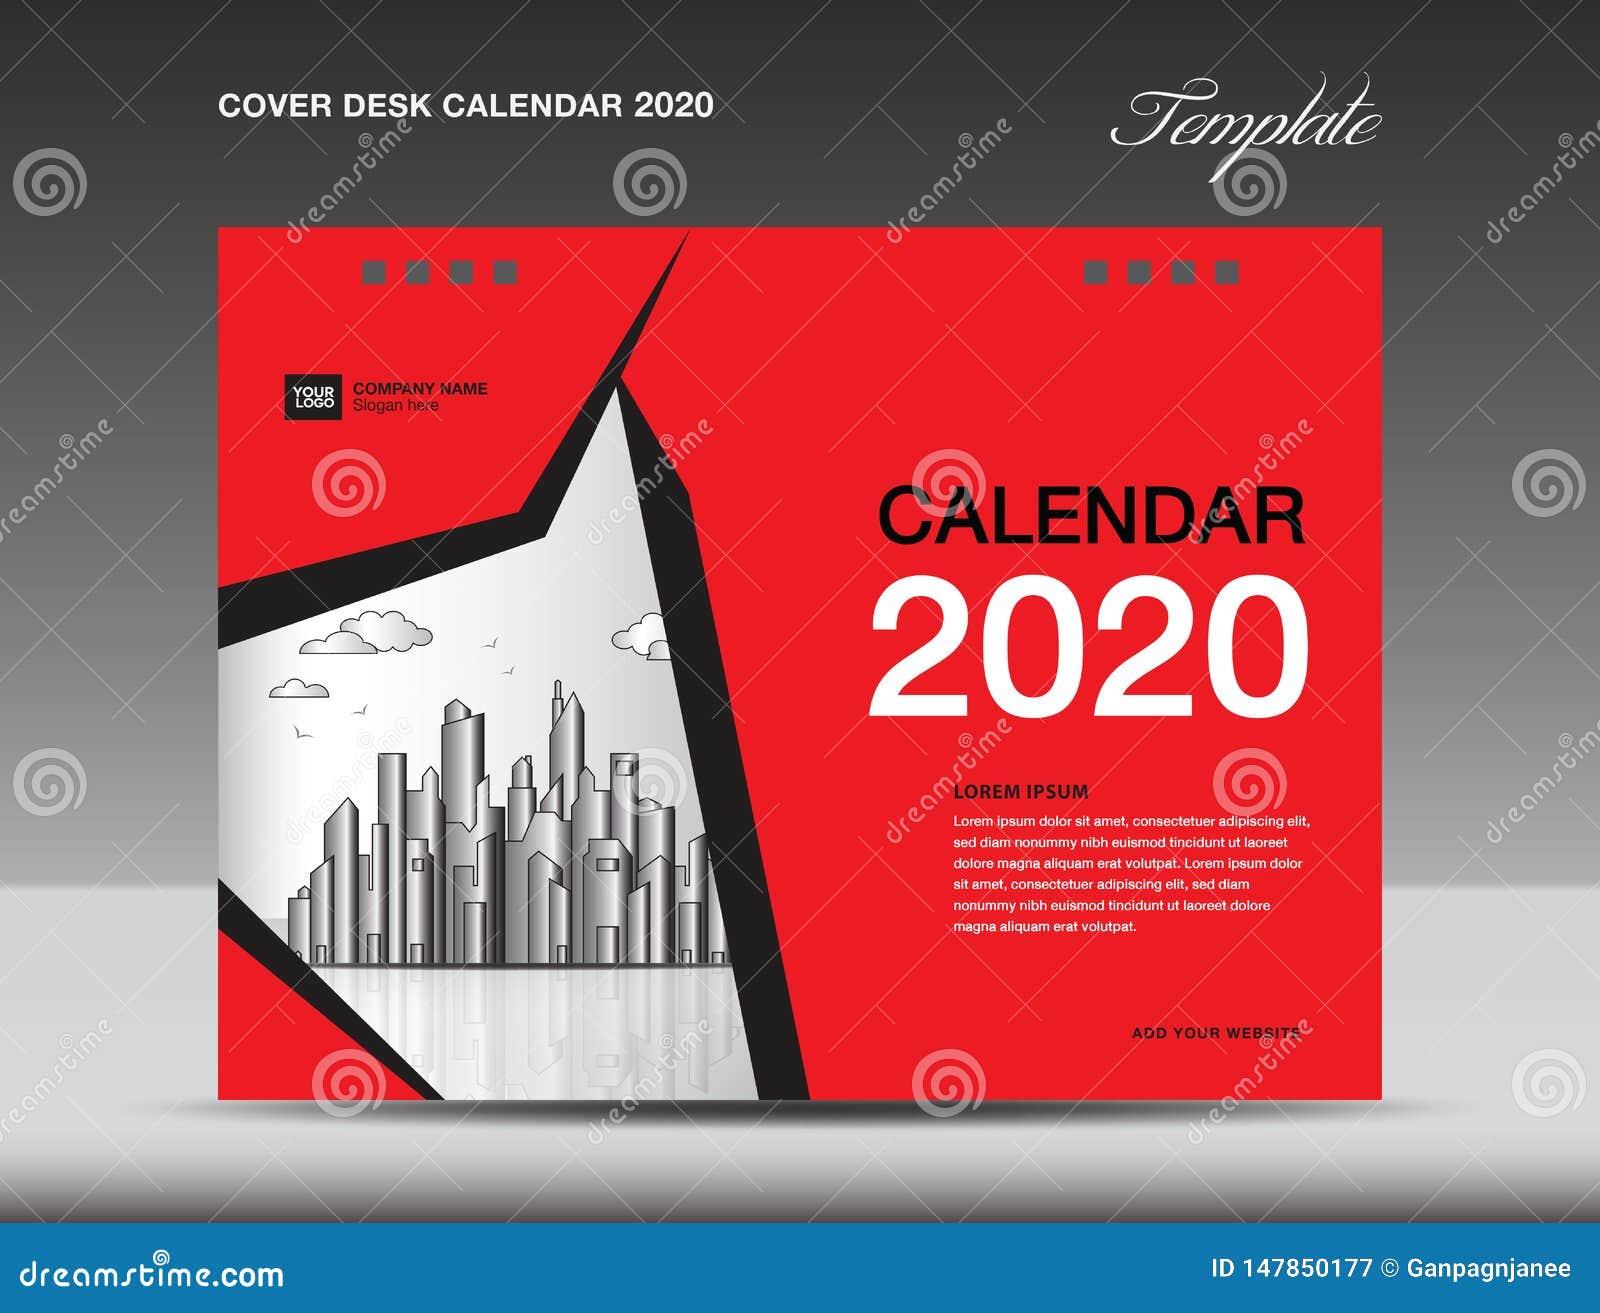 Cover Desk Calendar 2020 Design Flyer Template Ads Booklet Catalog Newsletter Book Cover Annual Report Cover Stock Vector Illustration Of 2020 Backdrop 147850177